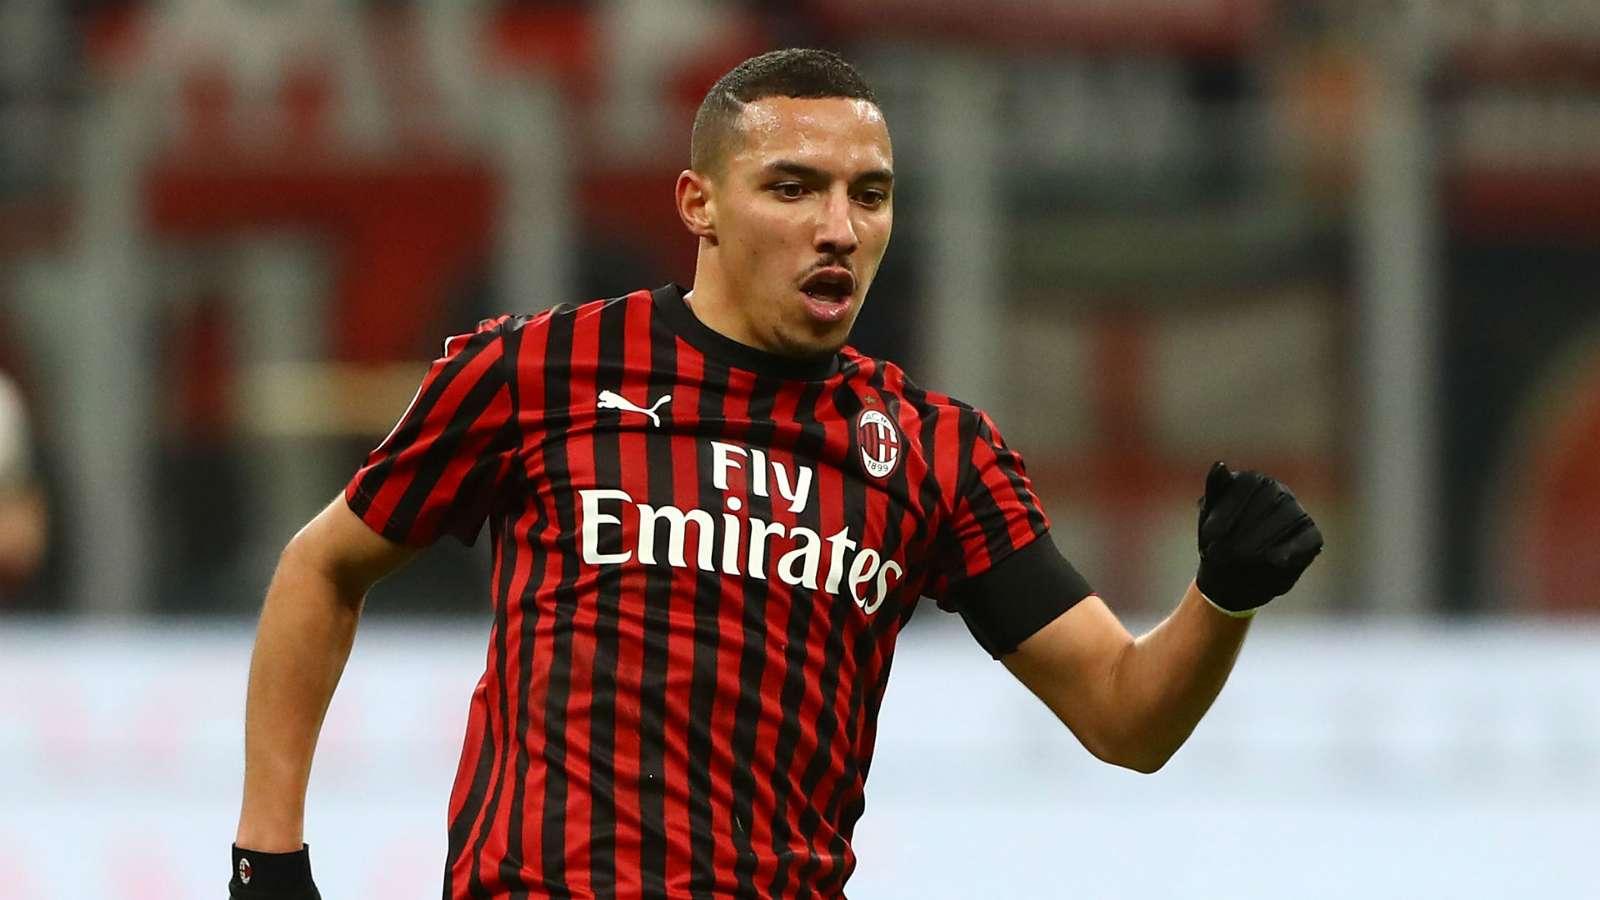 Ismael Bennacer Bangga Berbaju AC Milan, Ada Emblem Juara Liga Champions-nya